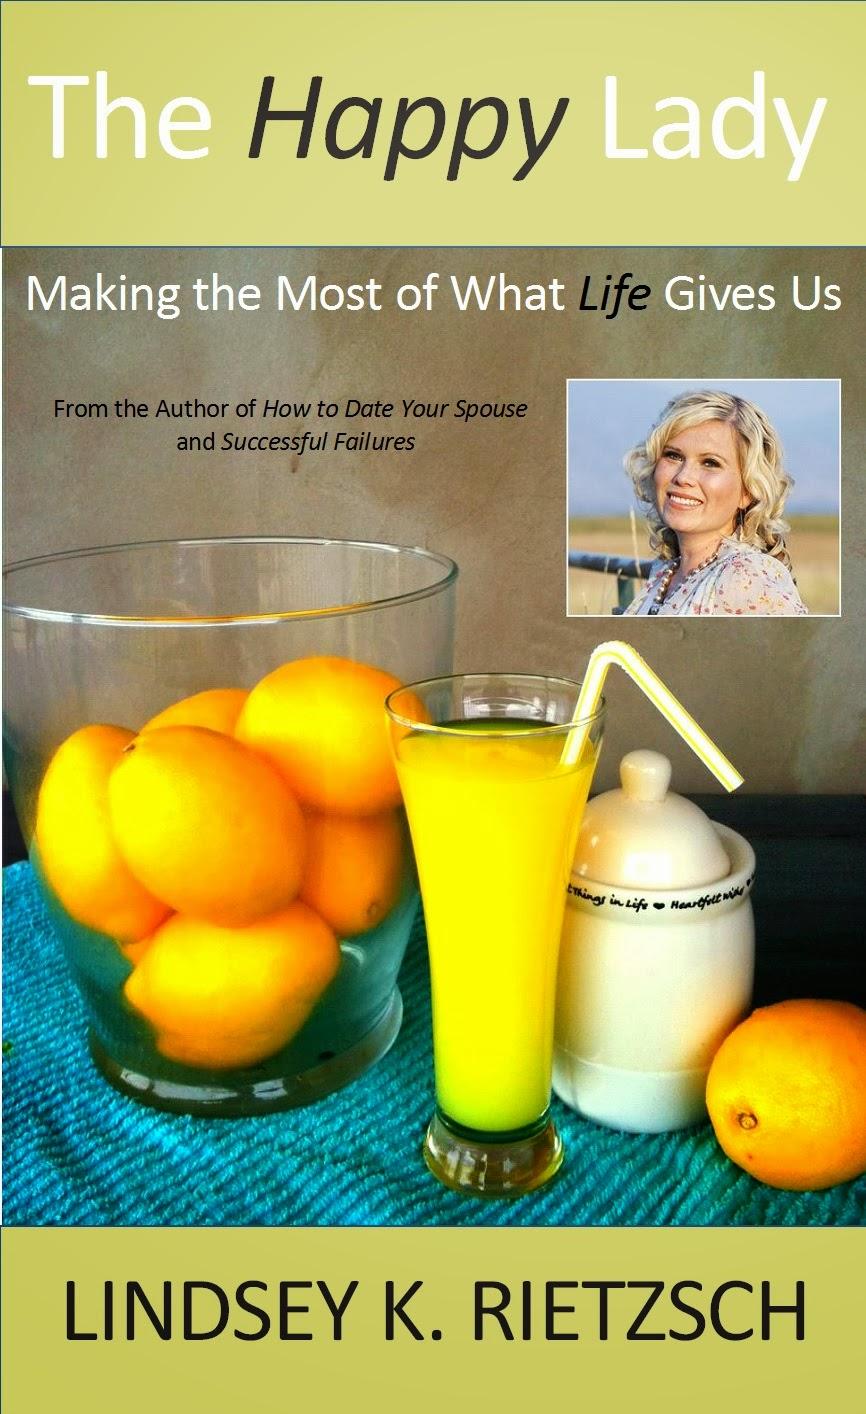 http://www.amazon.com/The-Happy-Lady-Making-Gives-ebook/dp/B00IU29JSY/ref=sr_1_4?ie=UTF8&qid=1394584708&sr=8-4&keywords=lindsey+rietzsch